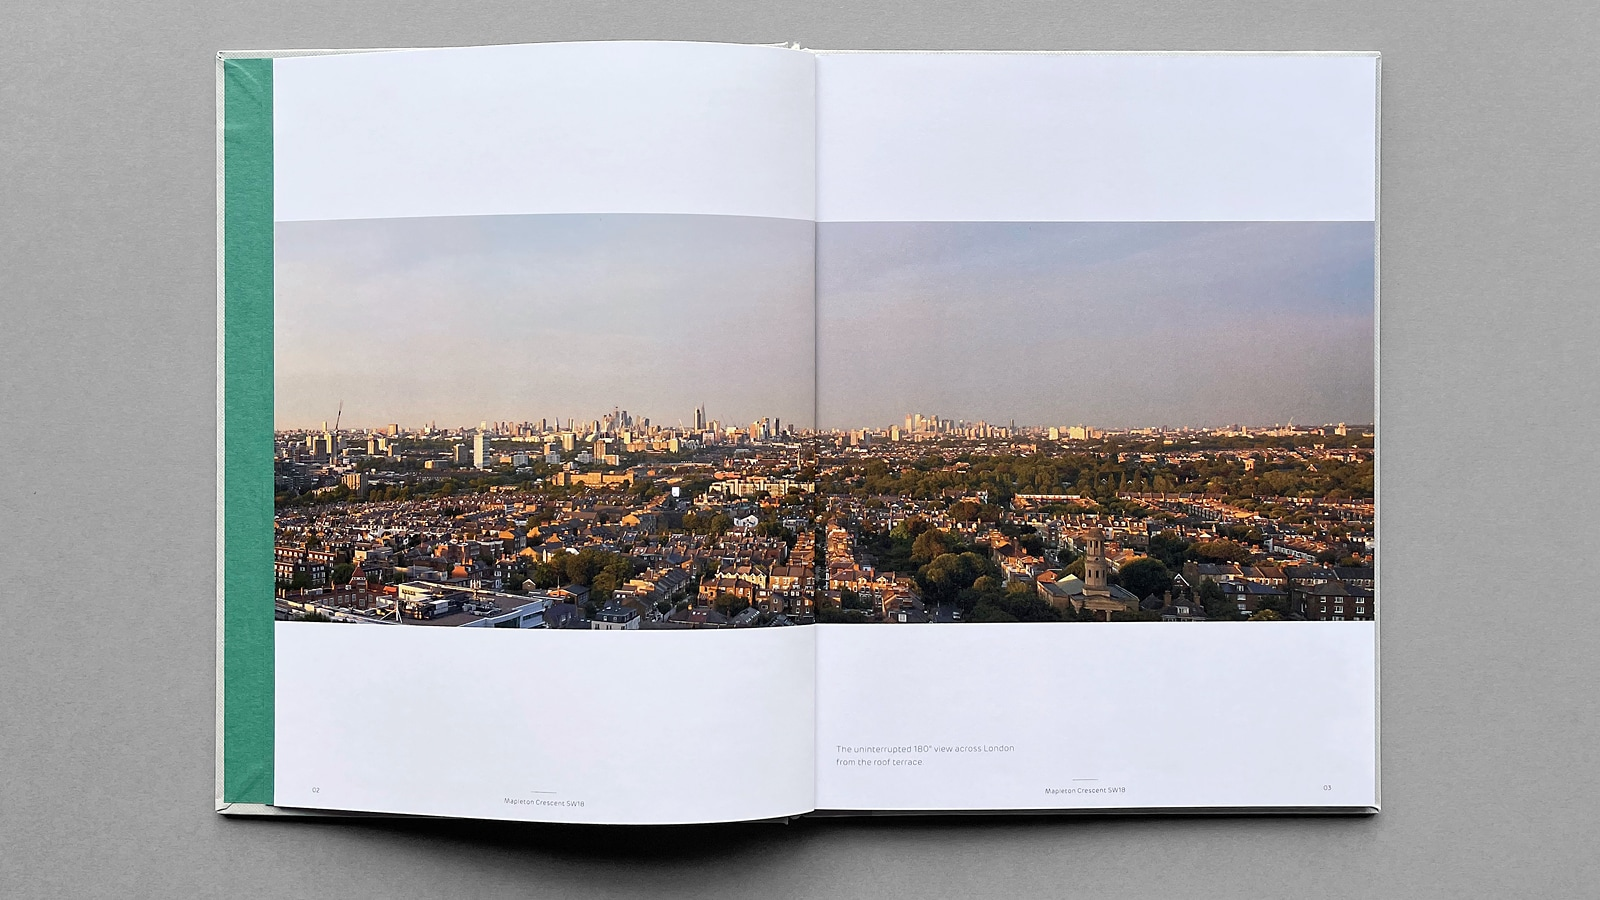 property-marketing-design-architecture-building-book-brochure-milton-keynes-london3